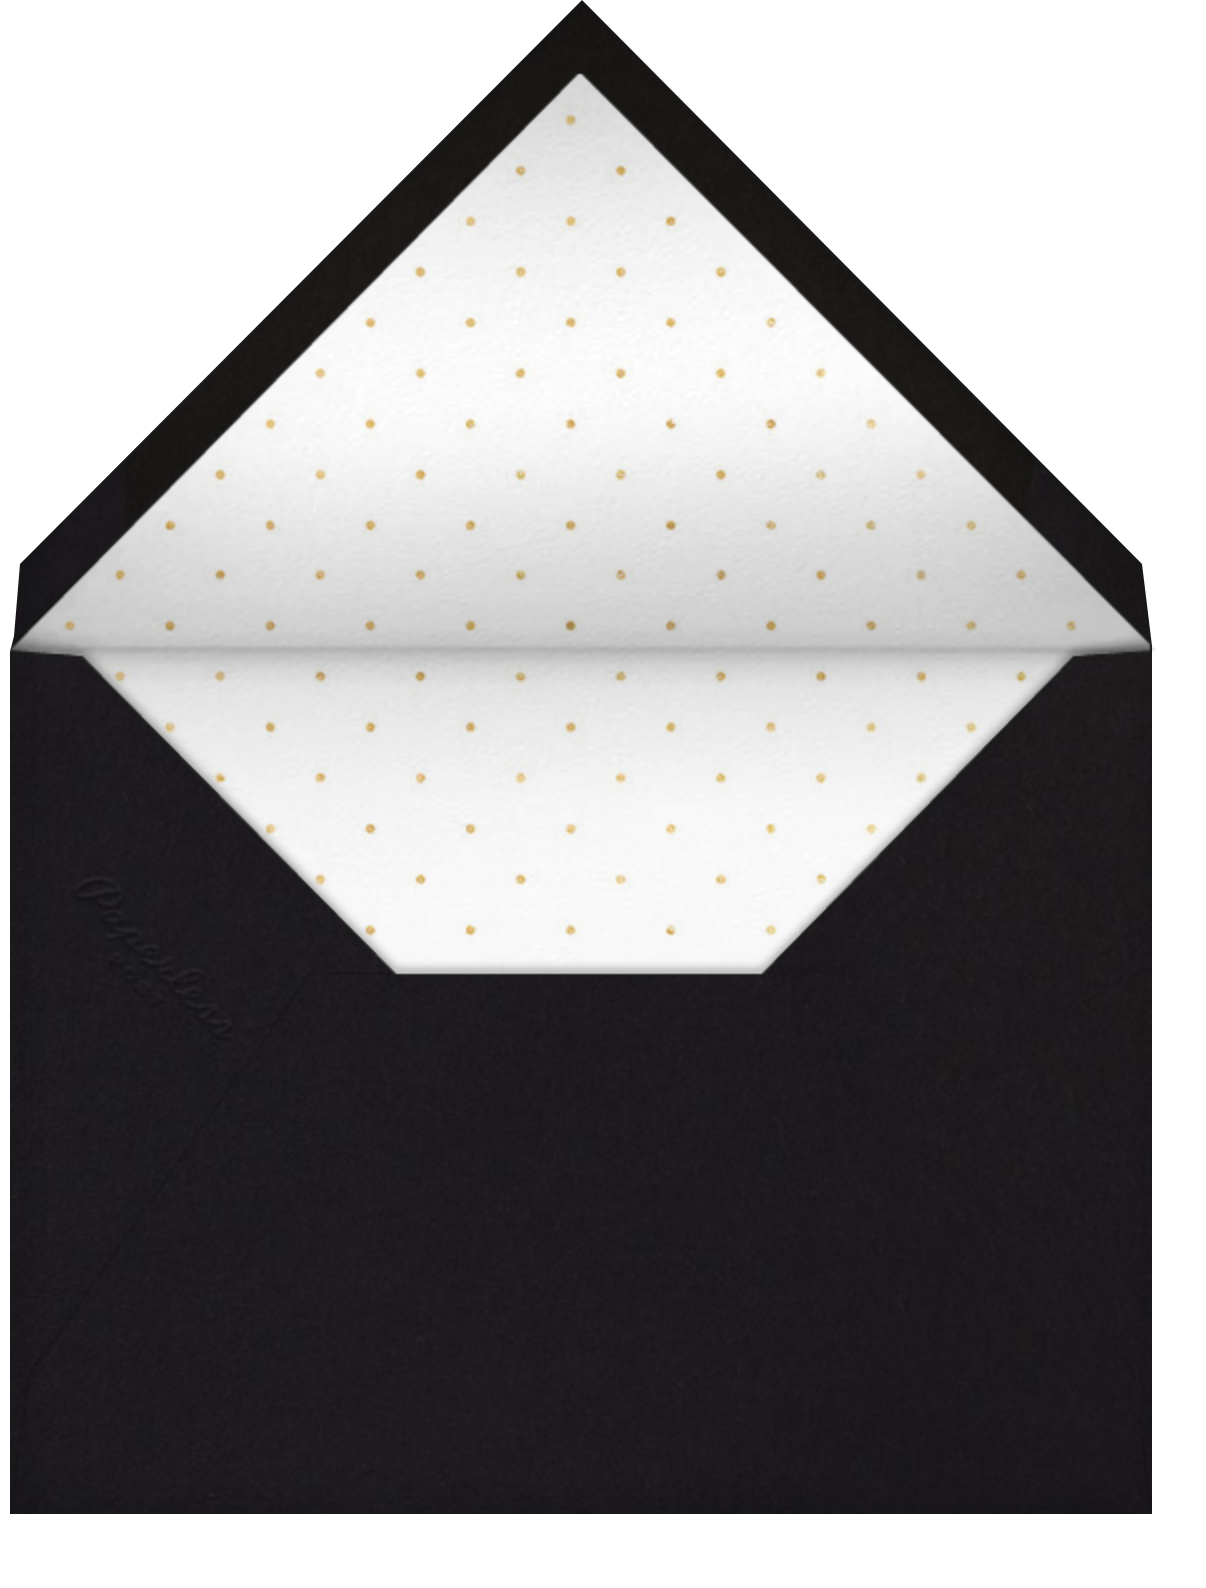 Deco Degree (Photo) - Paperless Post - Graduation party - envelope back